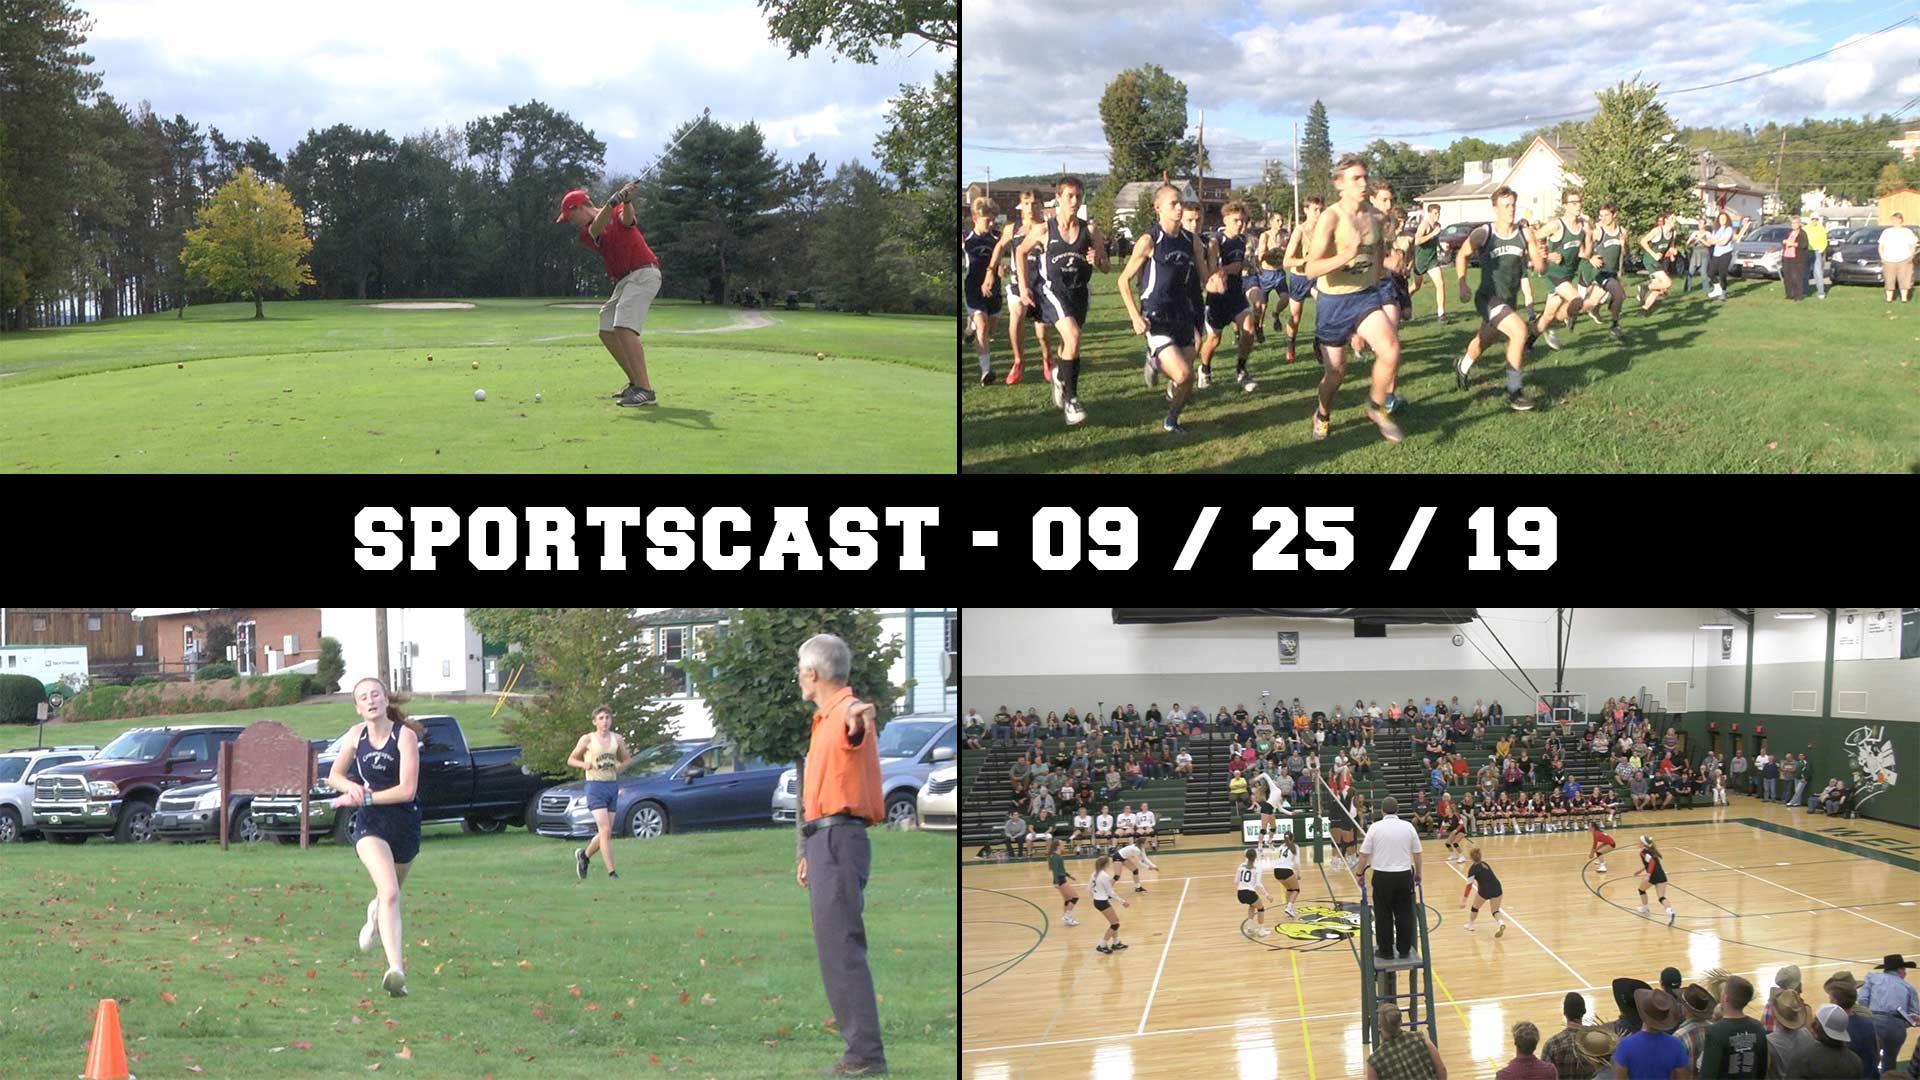 Sportscast – 09/24/19